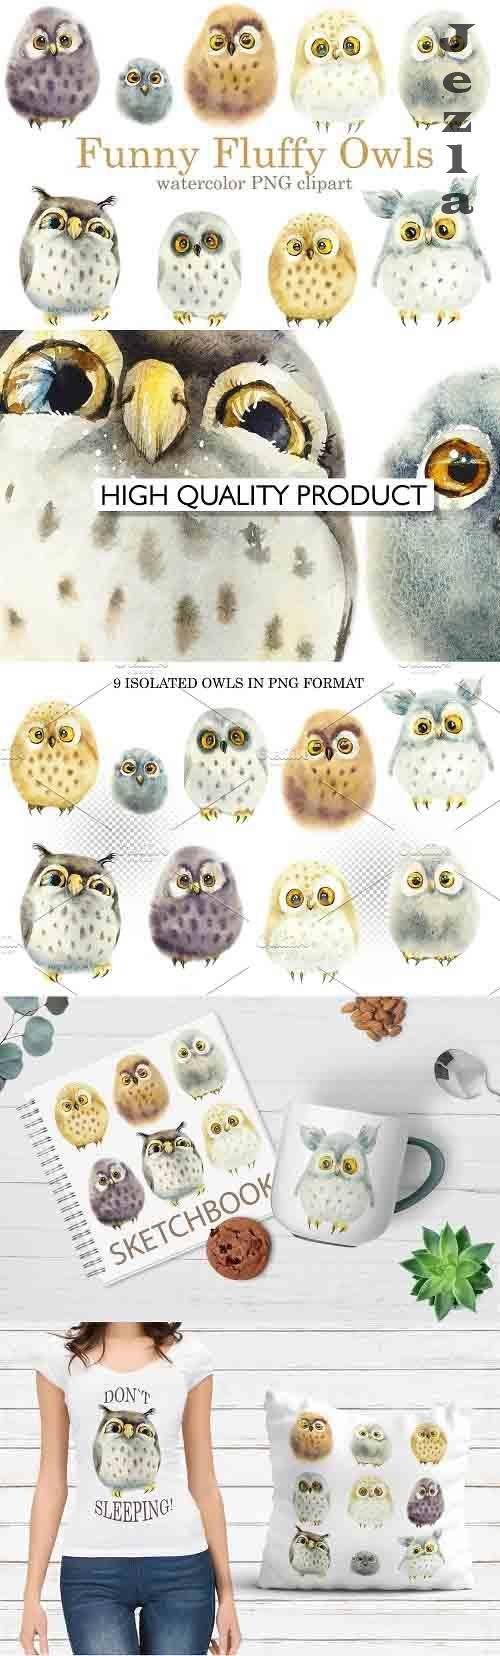 Watercolor Funny Owls - 6022757